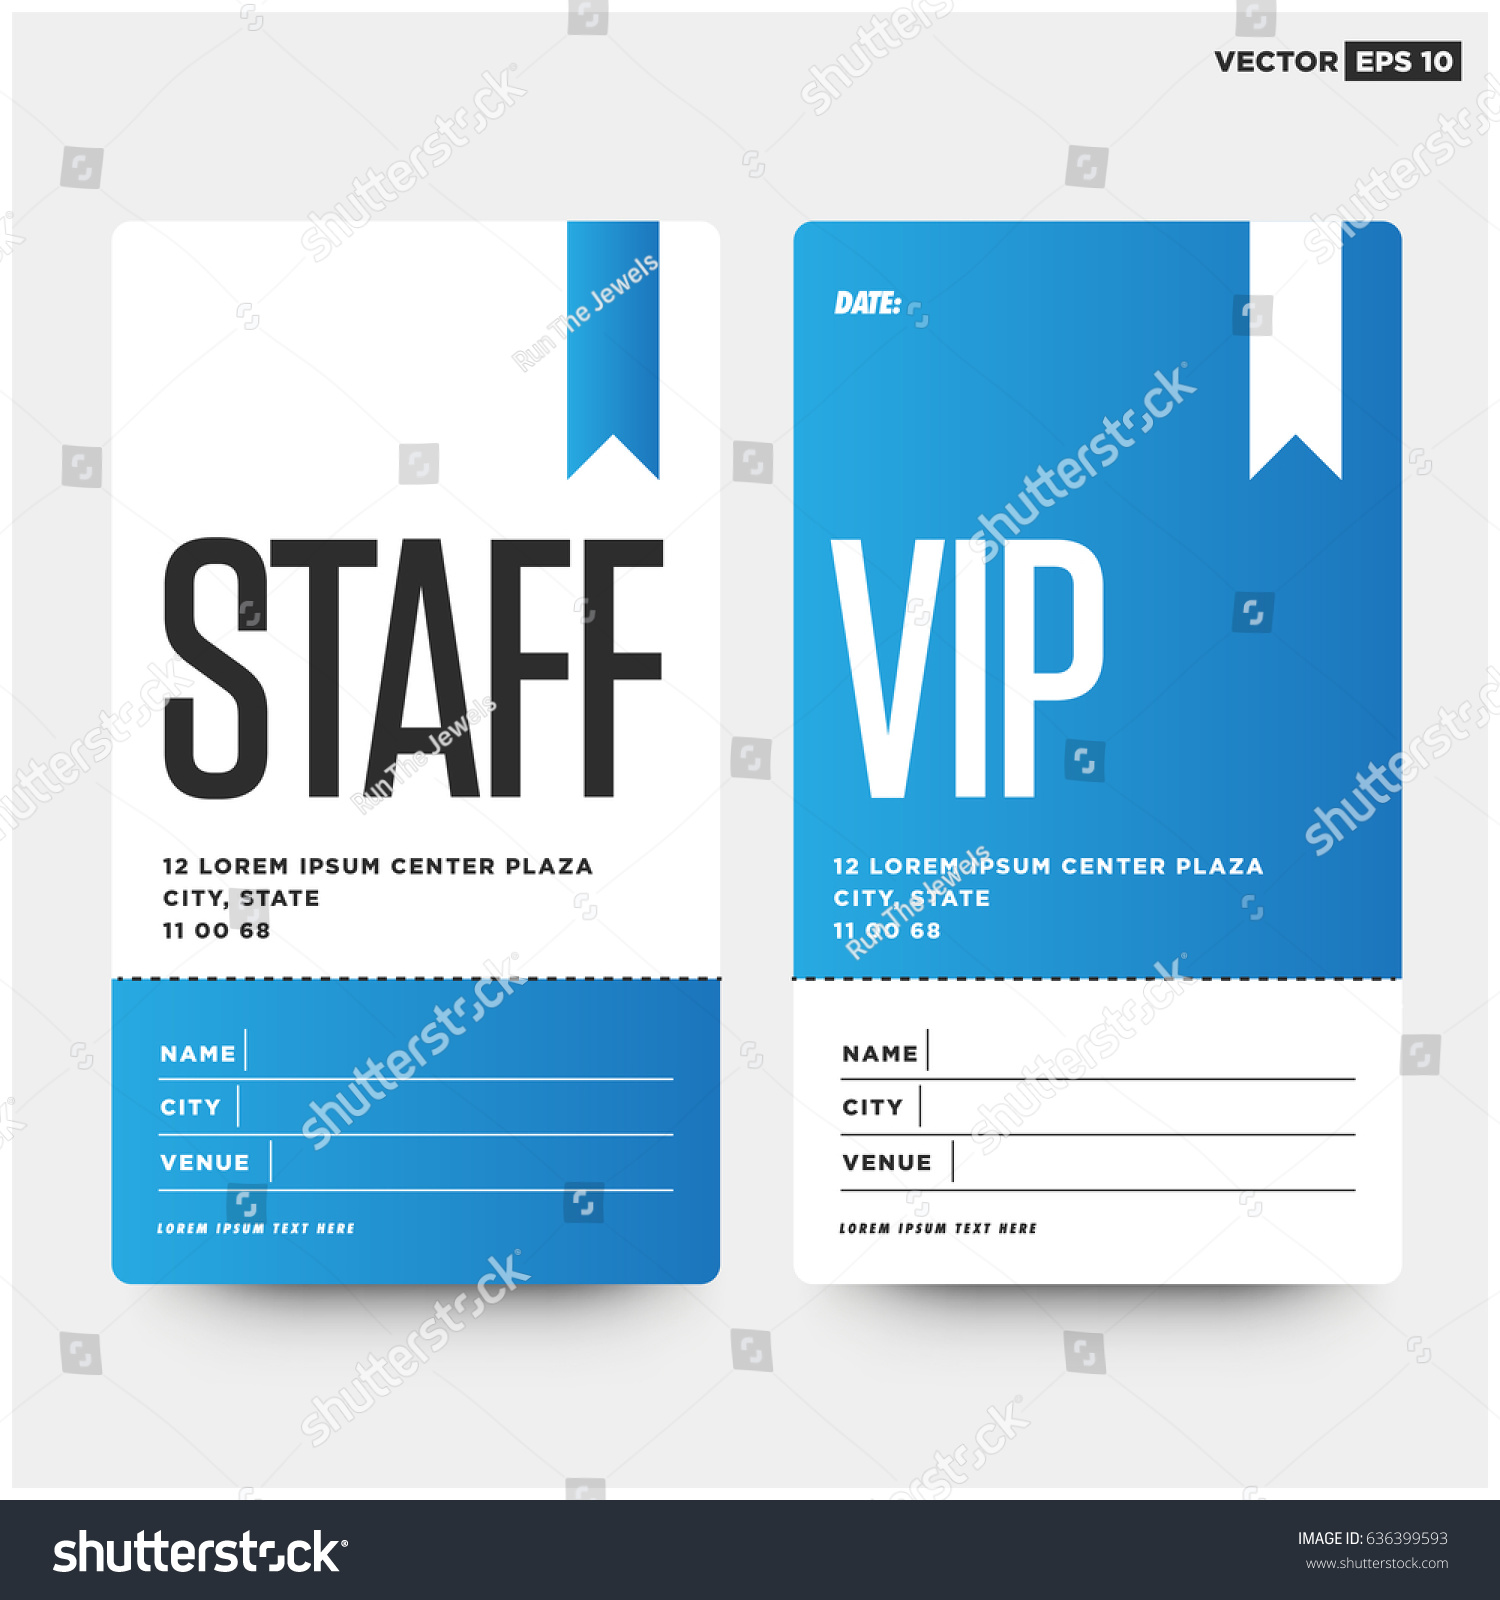 staff vip entry id card design stock vector 636399593 shutterstock. Black Bedroom Furniture Sets. Home Design Ideas